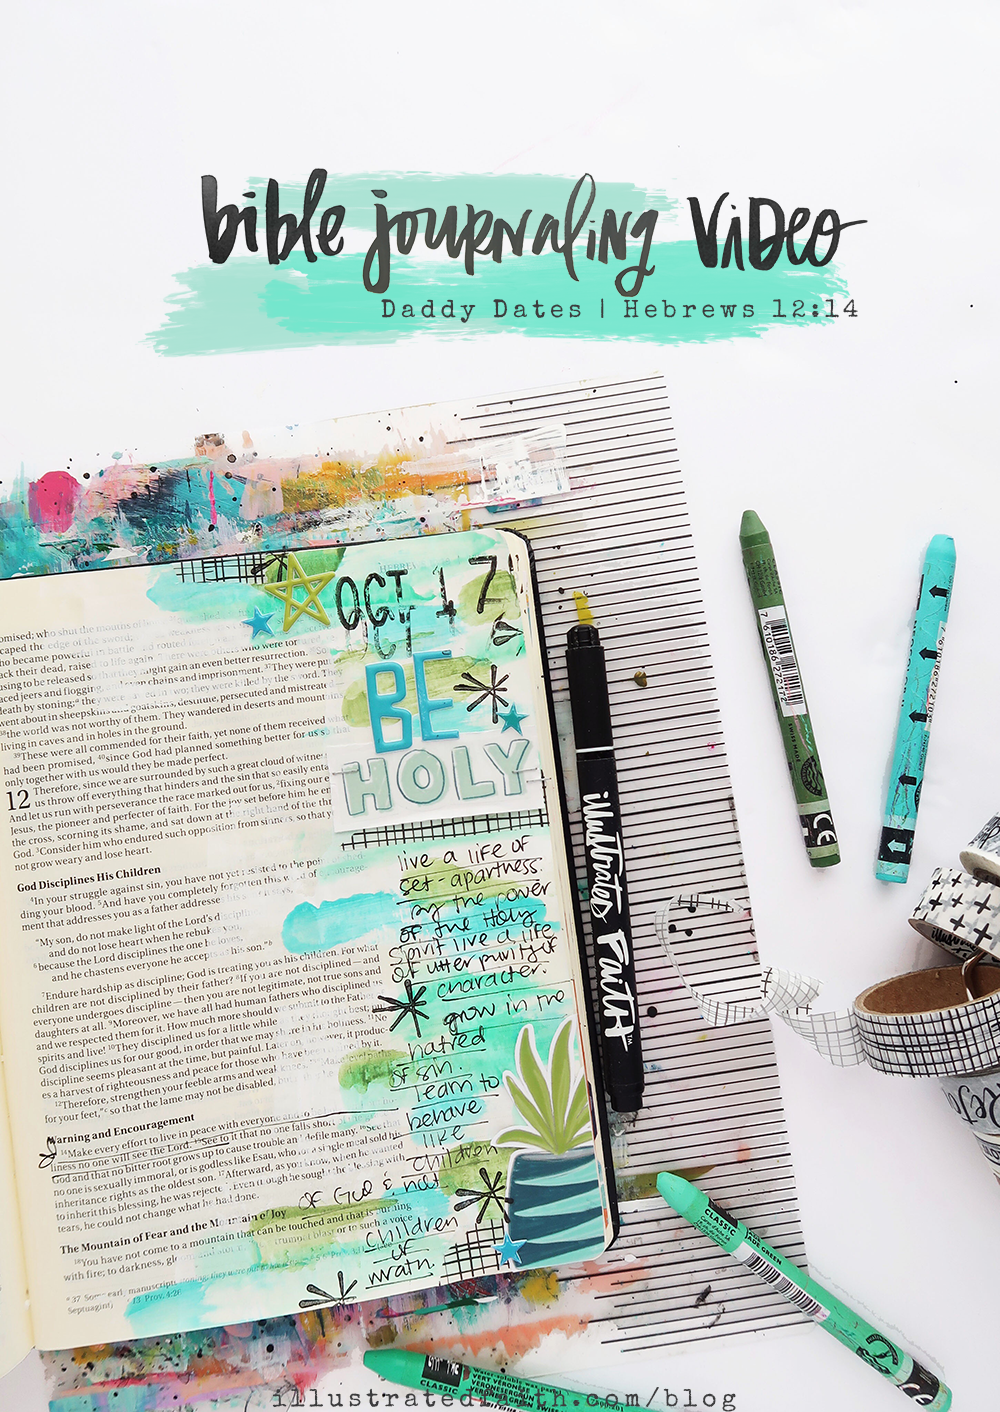 Hybrid Mixed Media Bible Journaling Process Video by Jillian aka Hello Jillsky using digital printables | Print and Pray Shop Daddy Dates | Hebrews 12:14